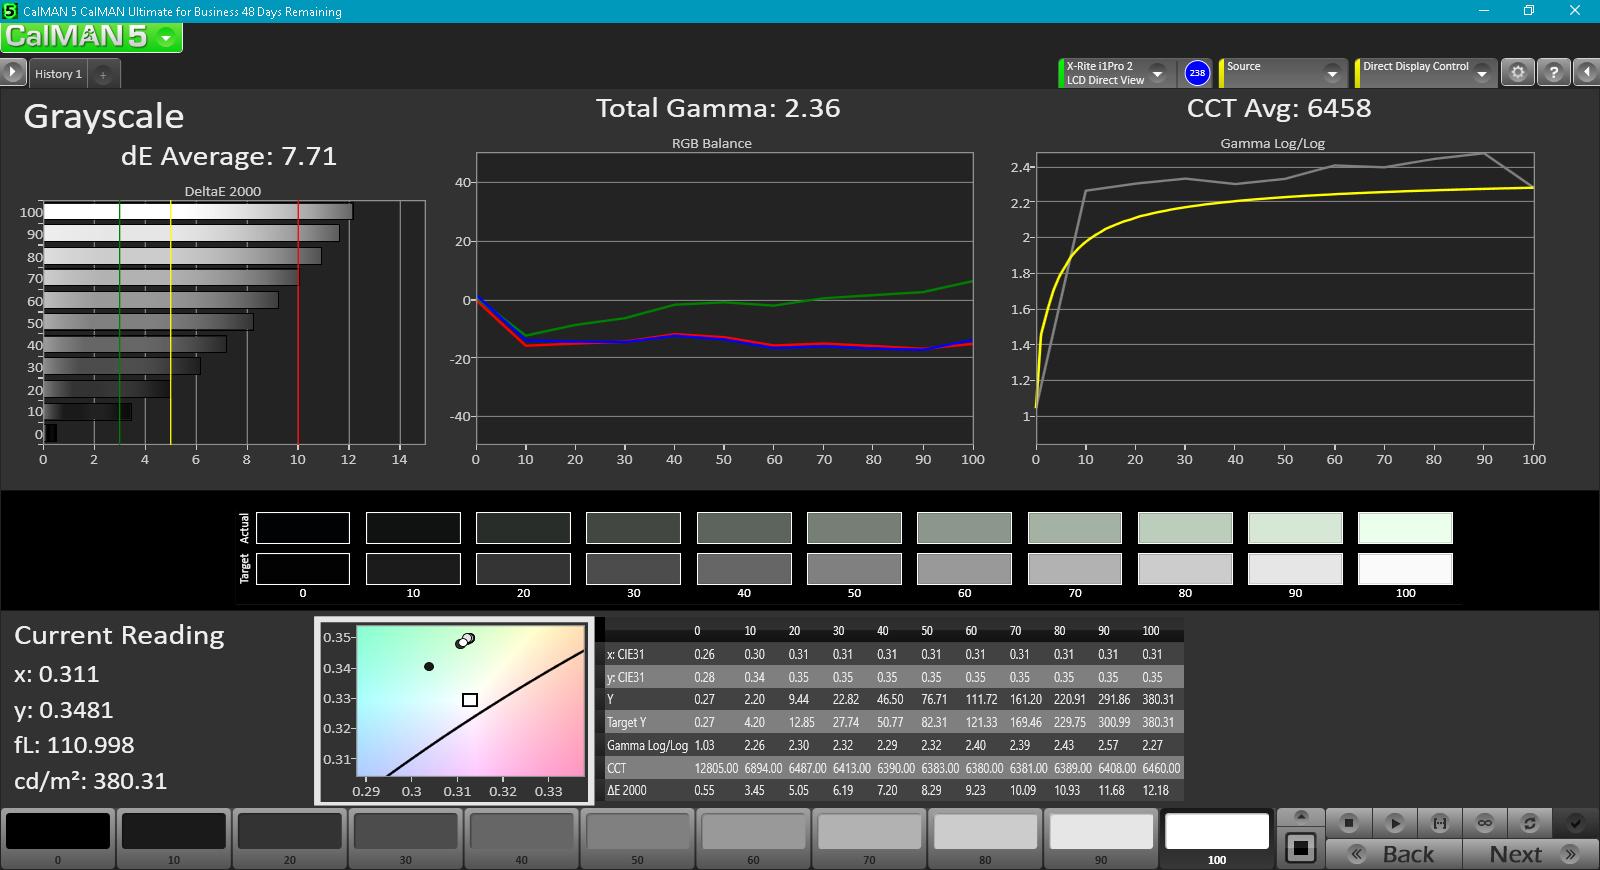 Sony vaio t13 review 2 alphr - Face Off Asus Zenbook Ux360ua Vs Hp Spectre X360 13 Vs Vaio Z Flip Notebookcheck Net Reviews